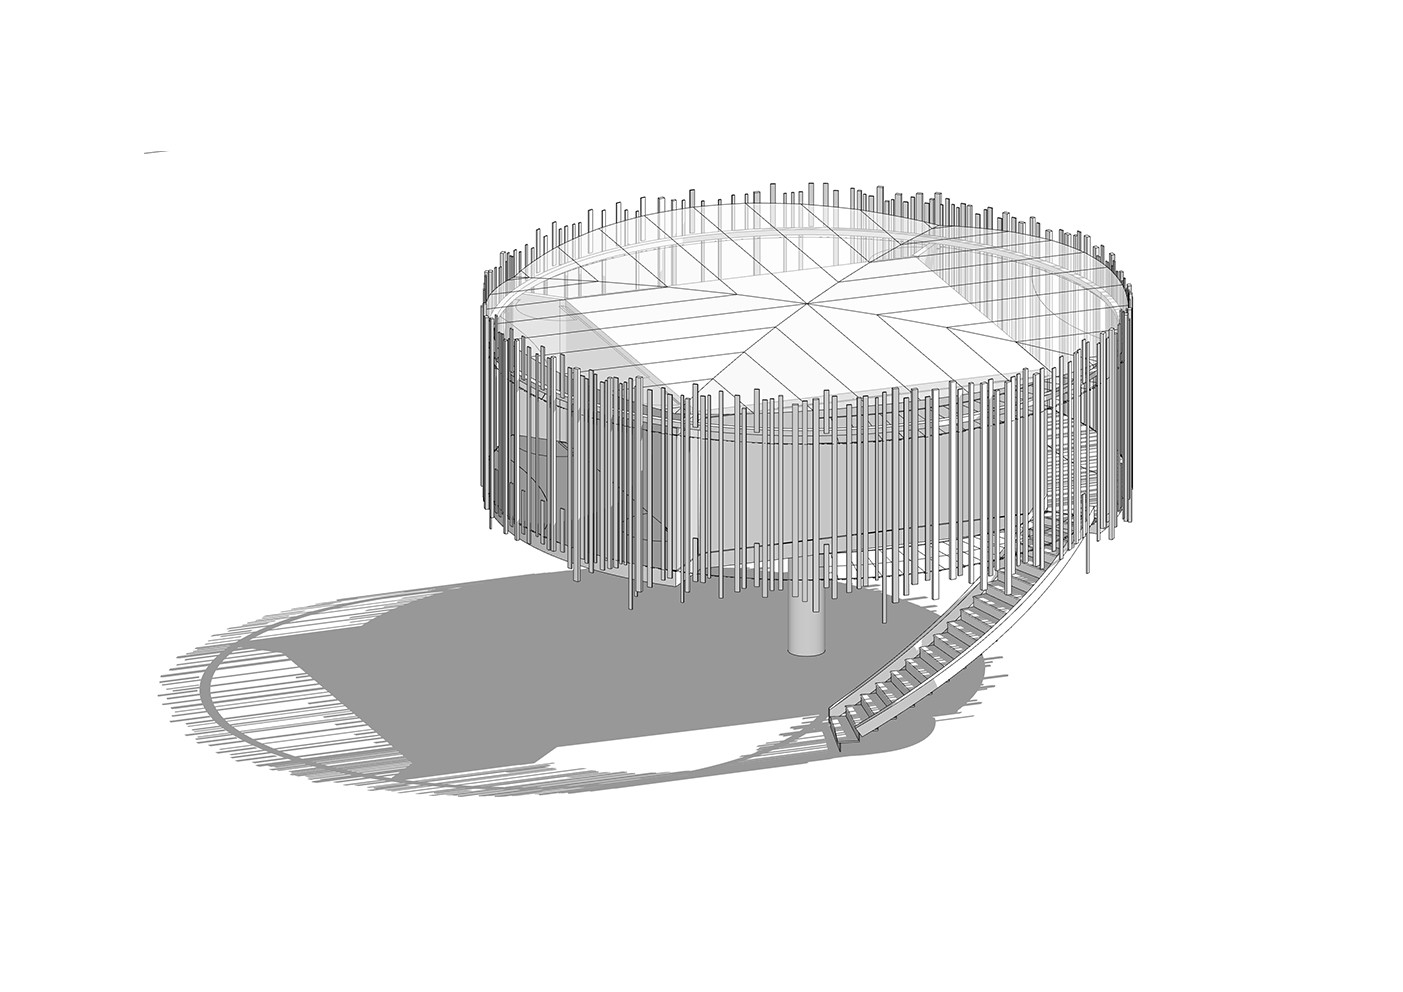 Axonometric view of Castan treehouse